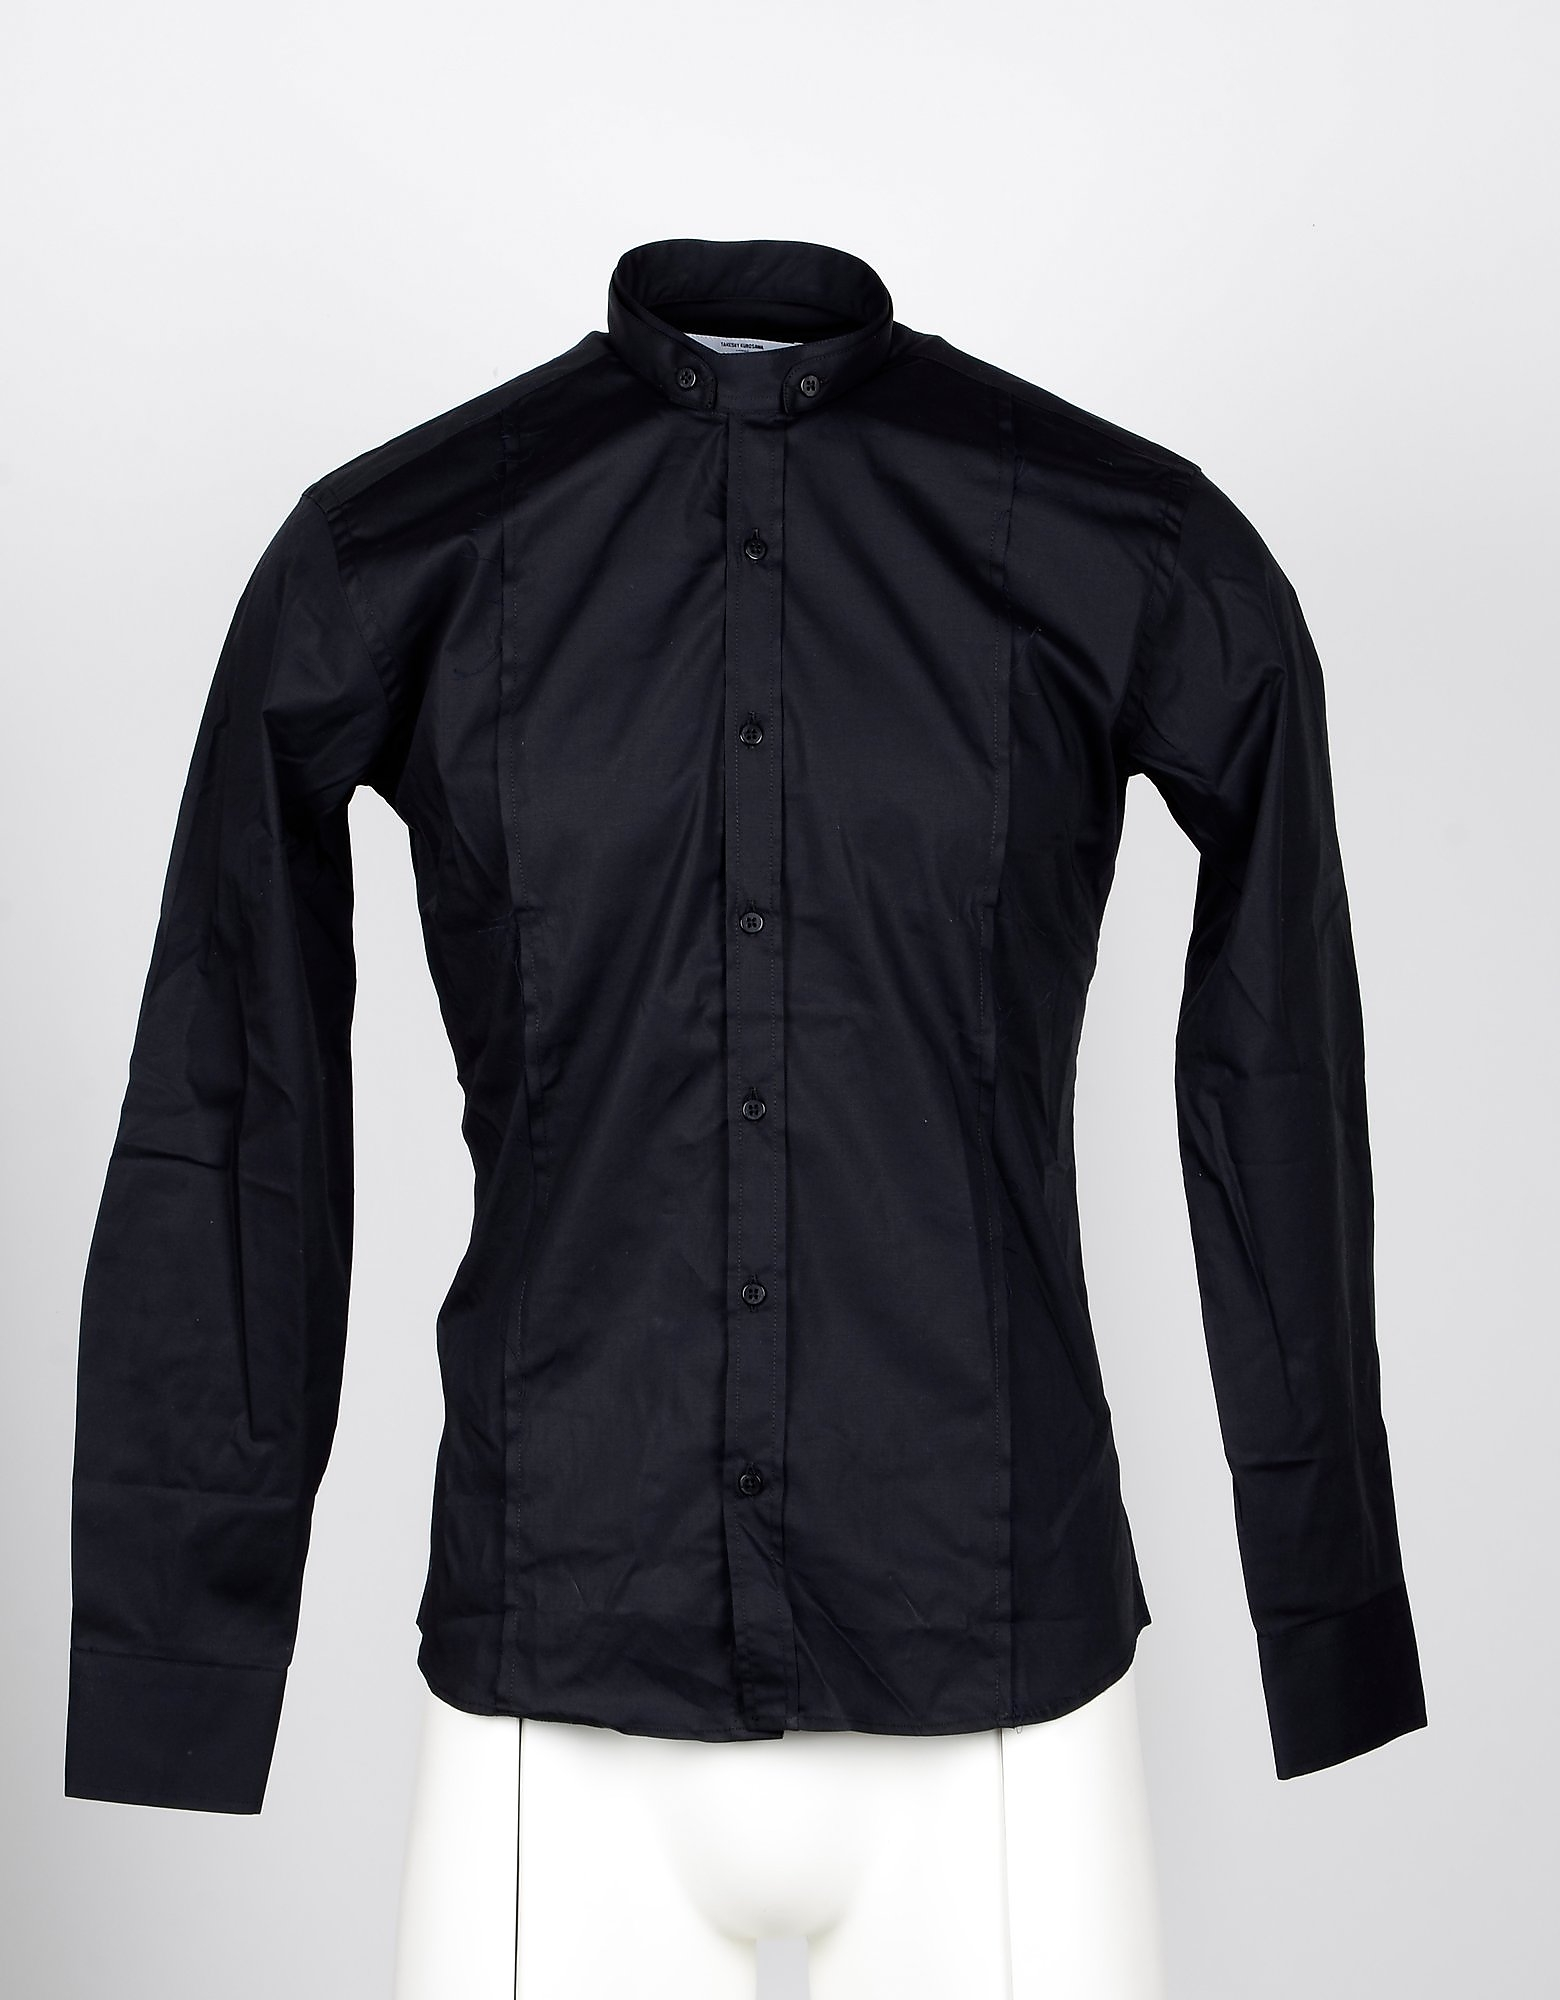 Takeshy Kurosawa Designer Shirts, Black Cotton Slim-Fit Men's Shirt